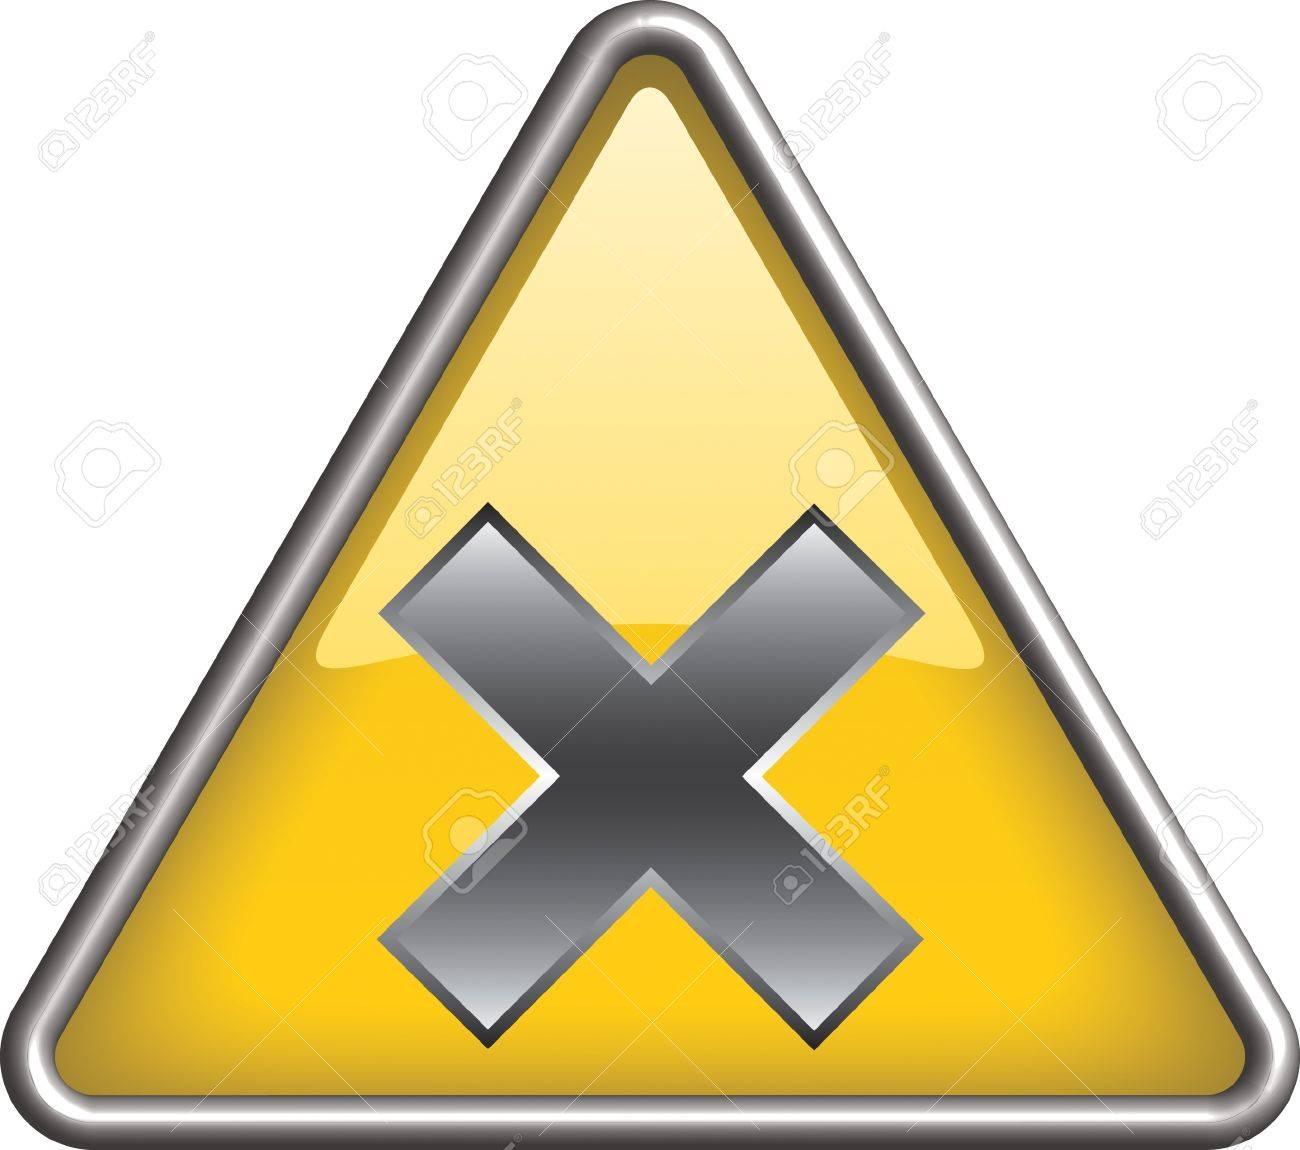 Irritant hazard icon symbol icon royalty free cliparts vectors irritant hazard icon symbol icon stock vector 9165106 biocorpaavc Gallery